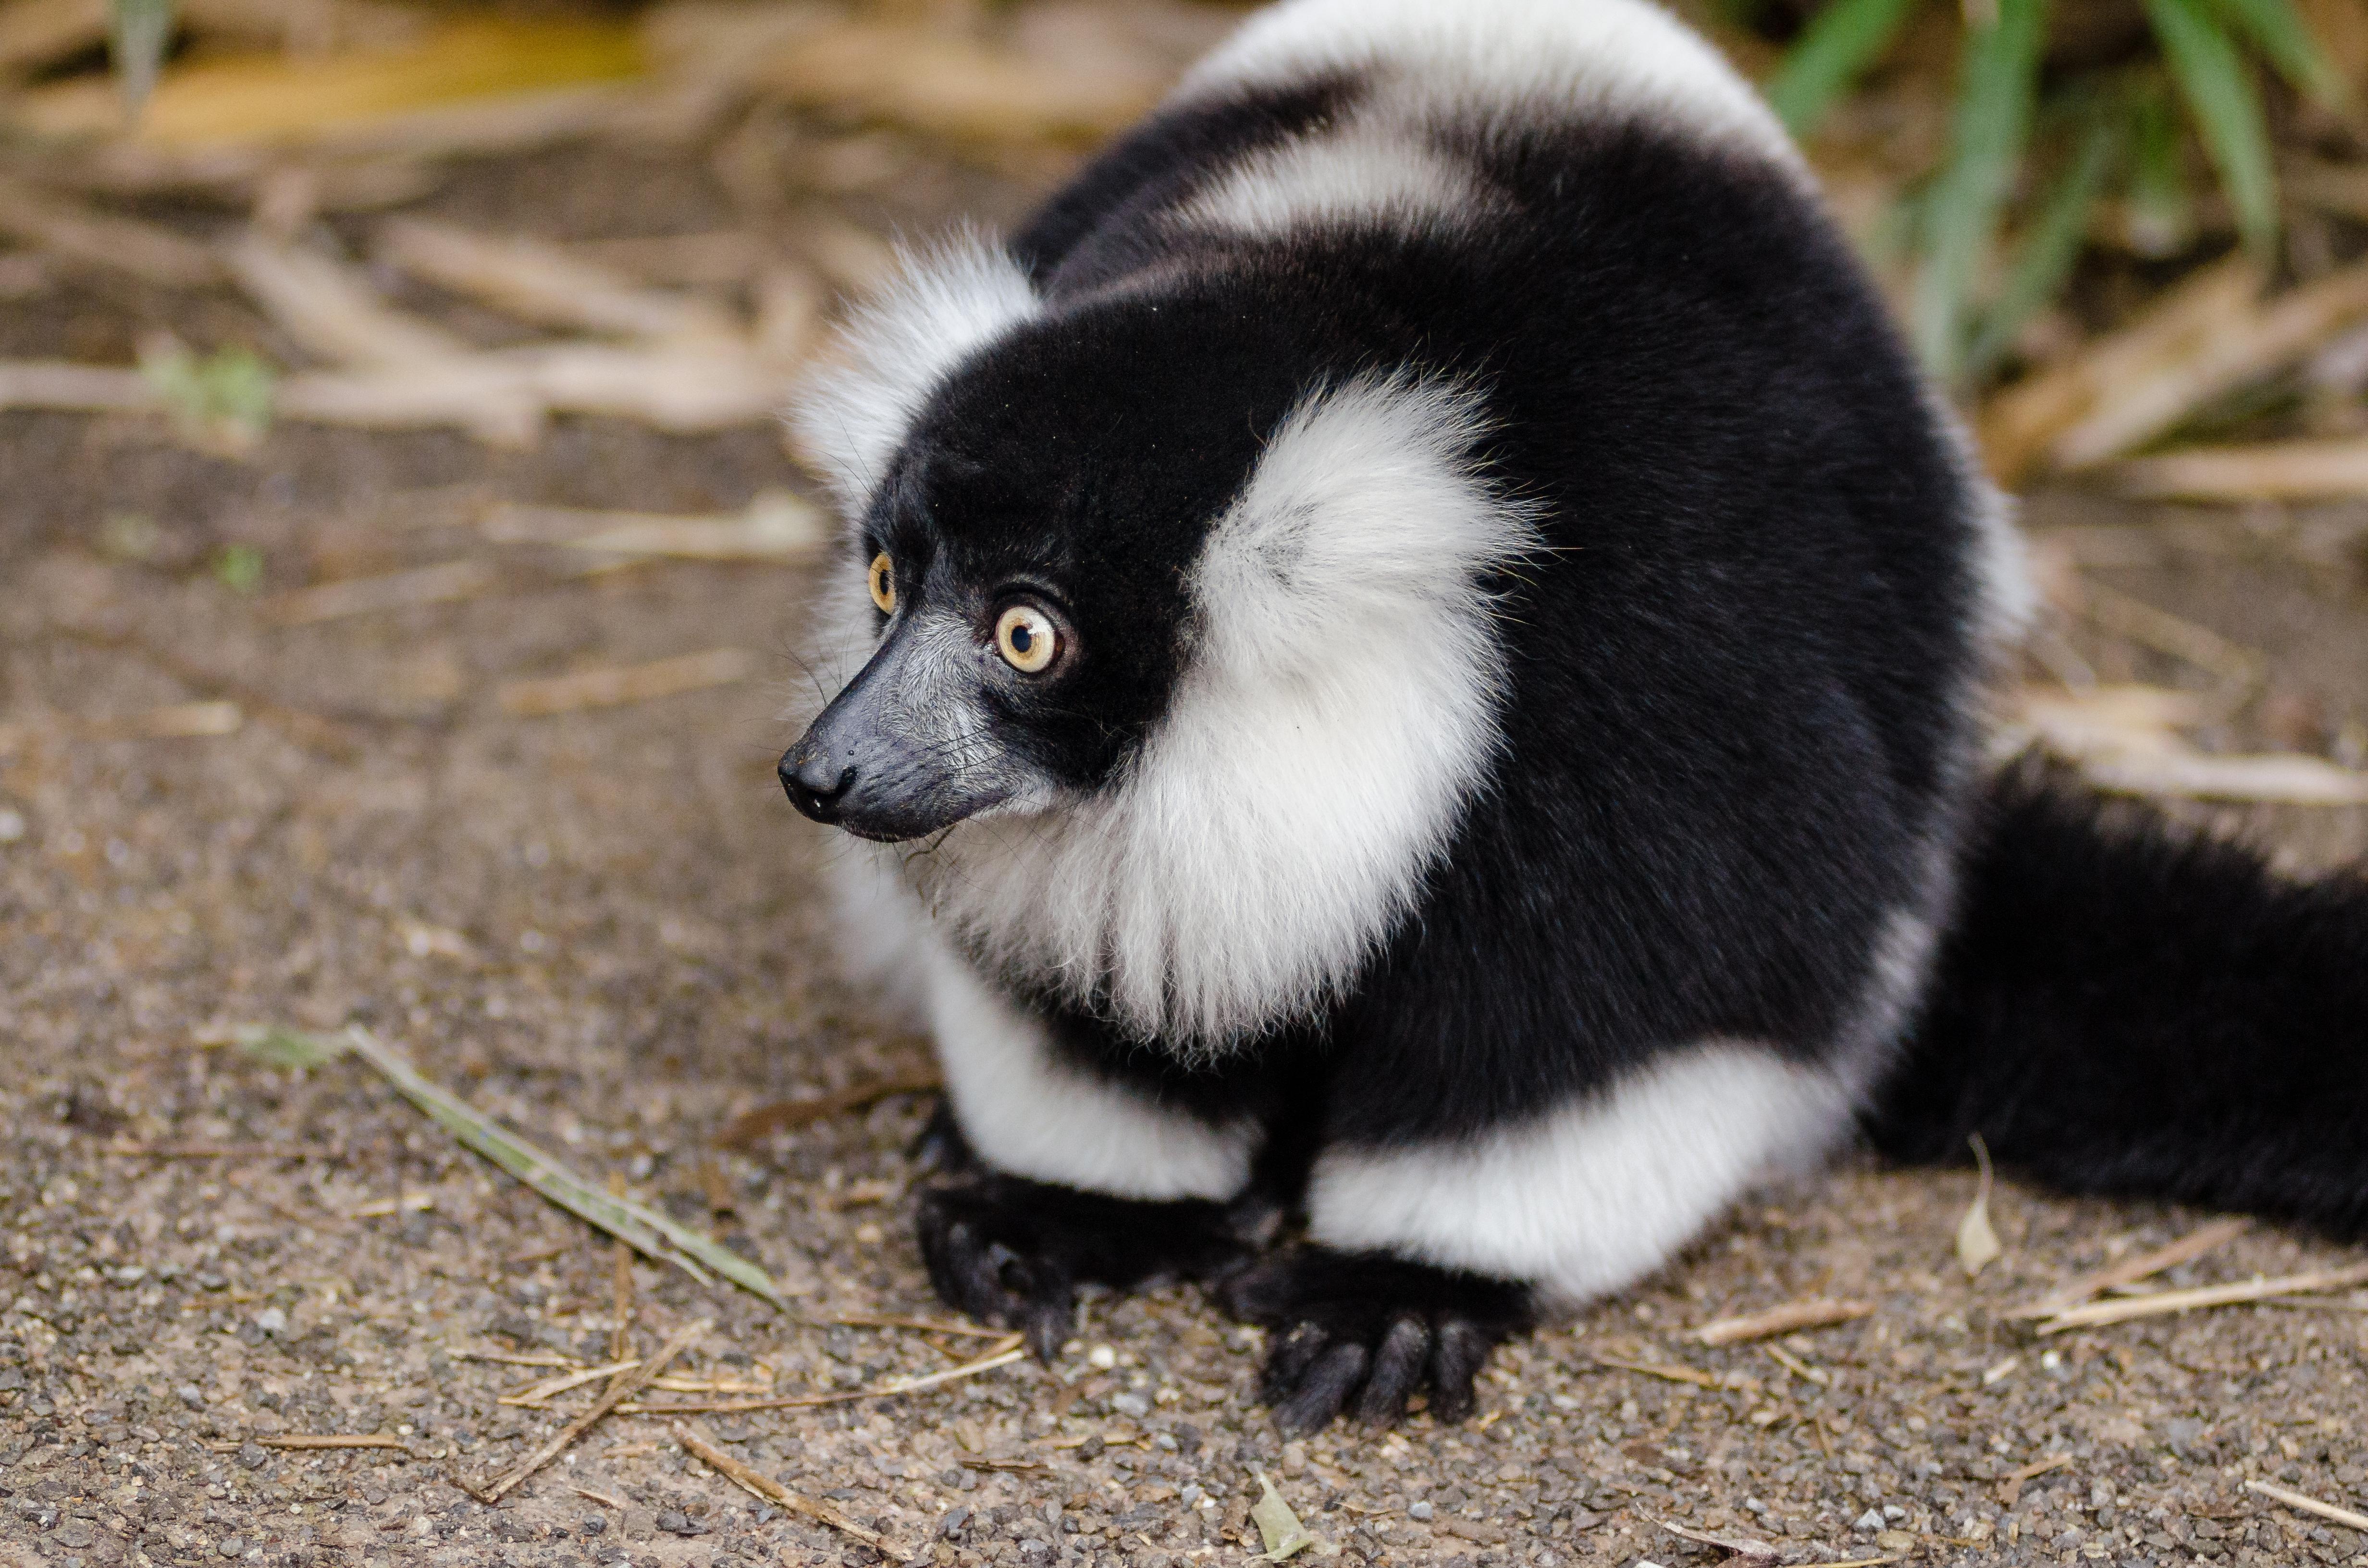 102612 download wallpaper Animals, Lemur Cook, Lemur Vari, Lemur, Surprise, Astonishment screensavers and pictures for free